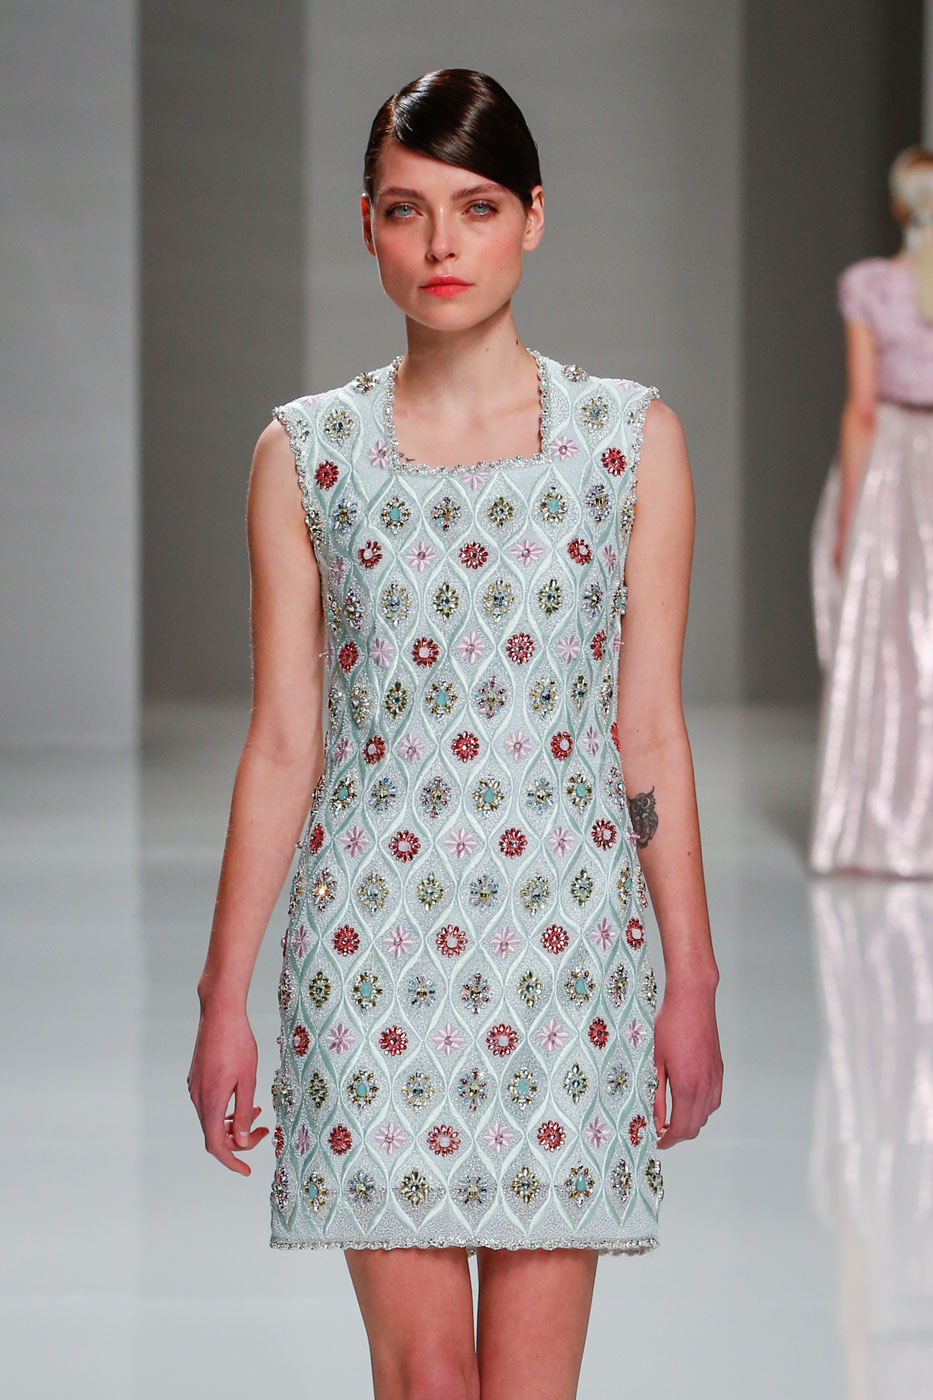 Georges-Hobeika-fashion-runway-show-haute-couture-paris-spring-2015-the-impression-16